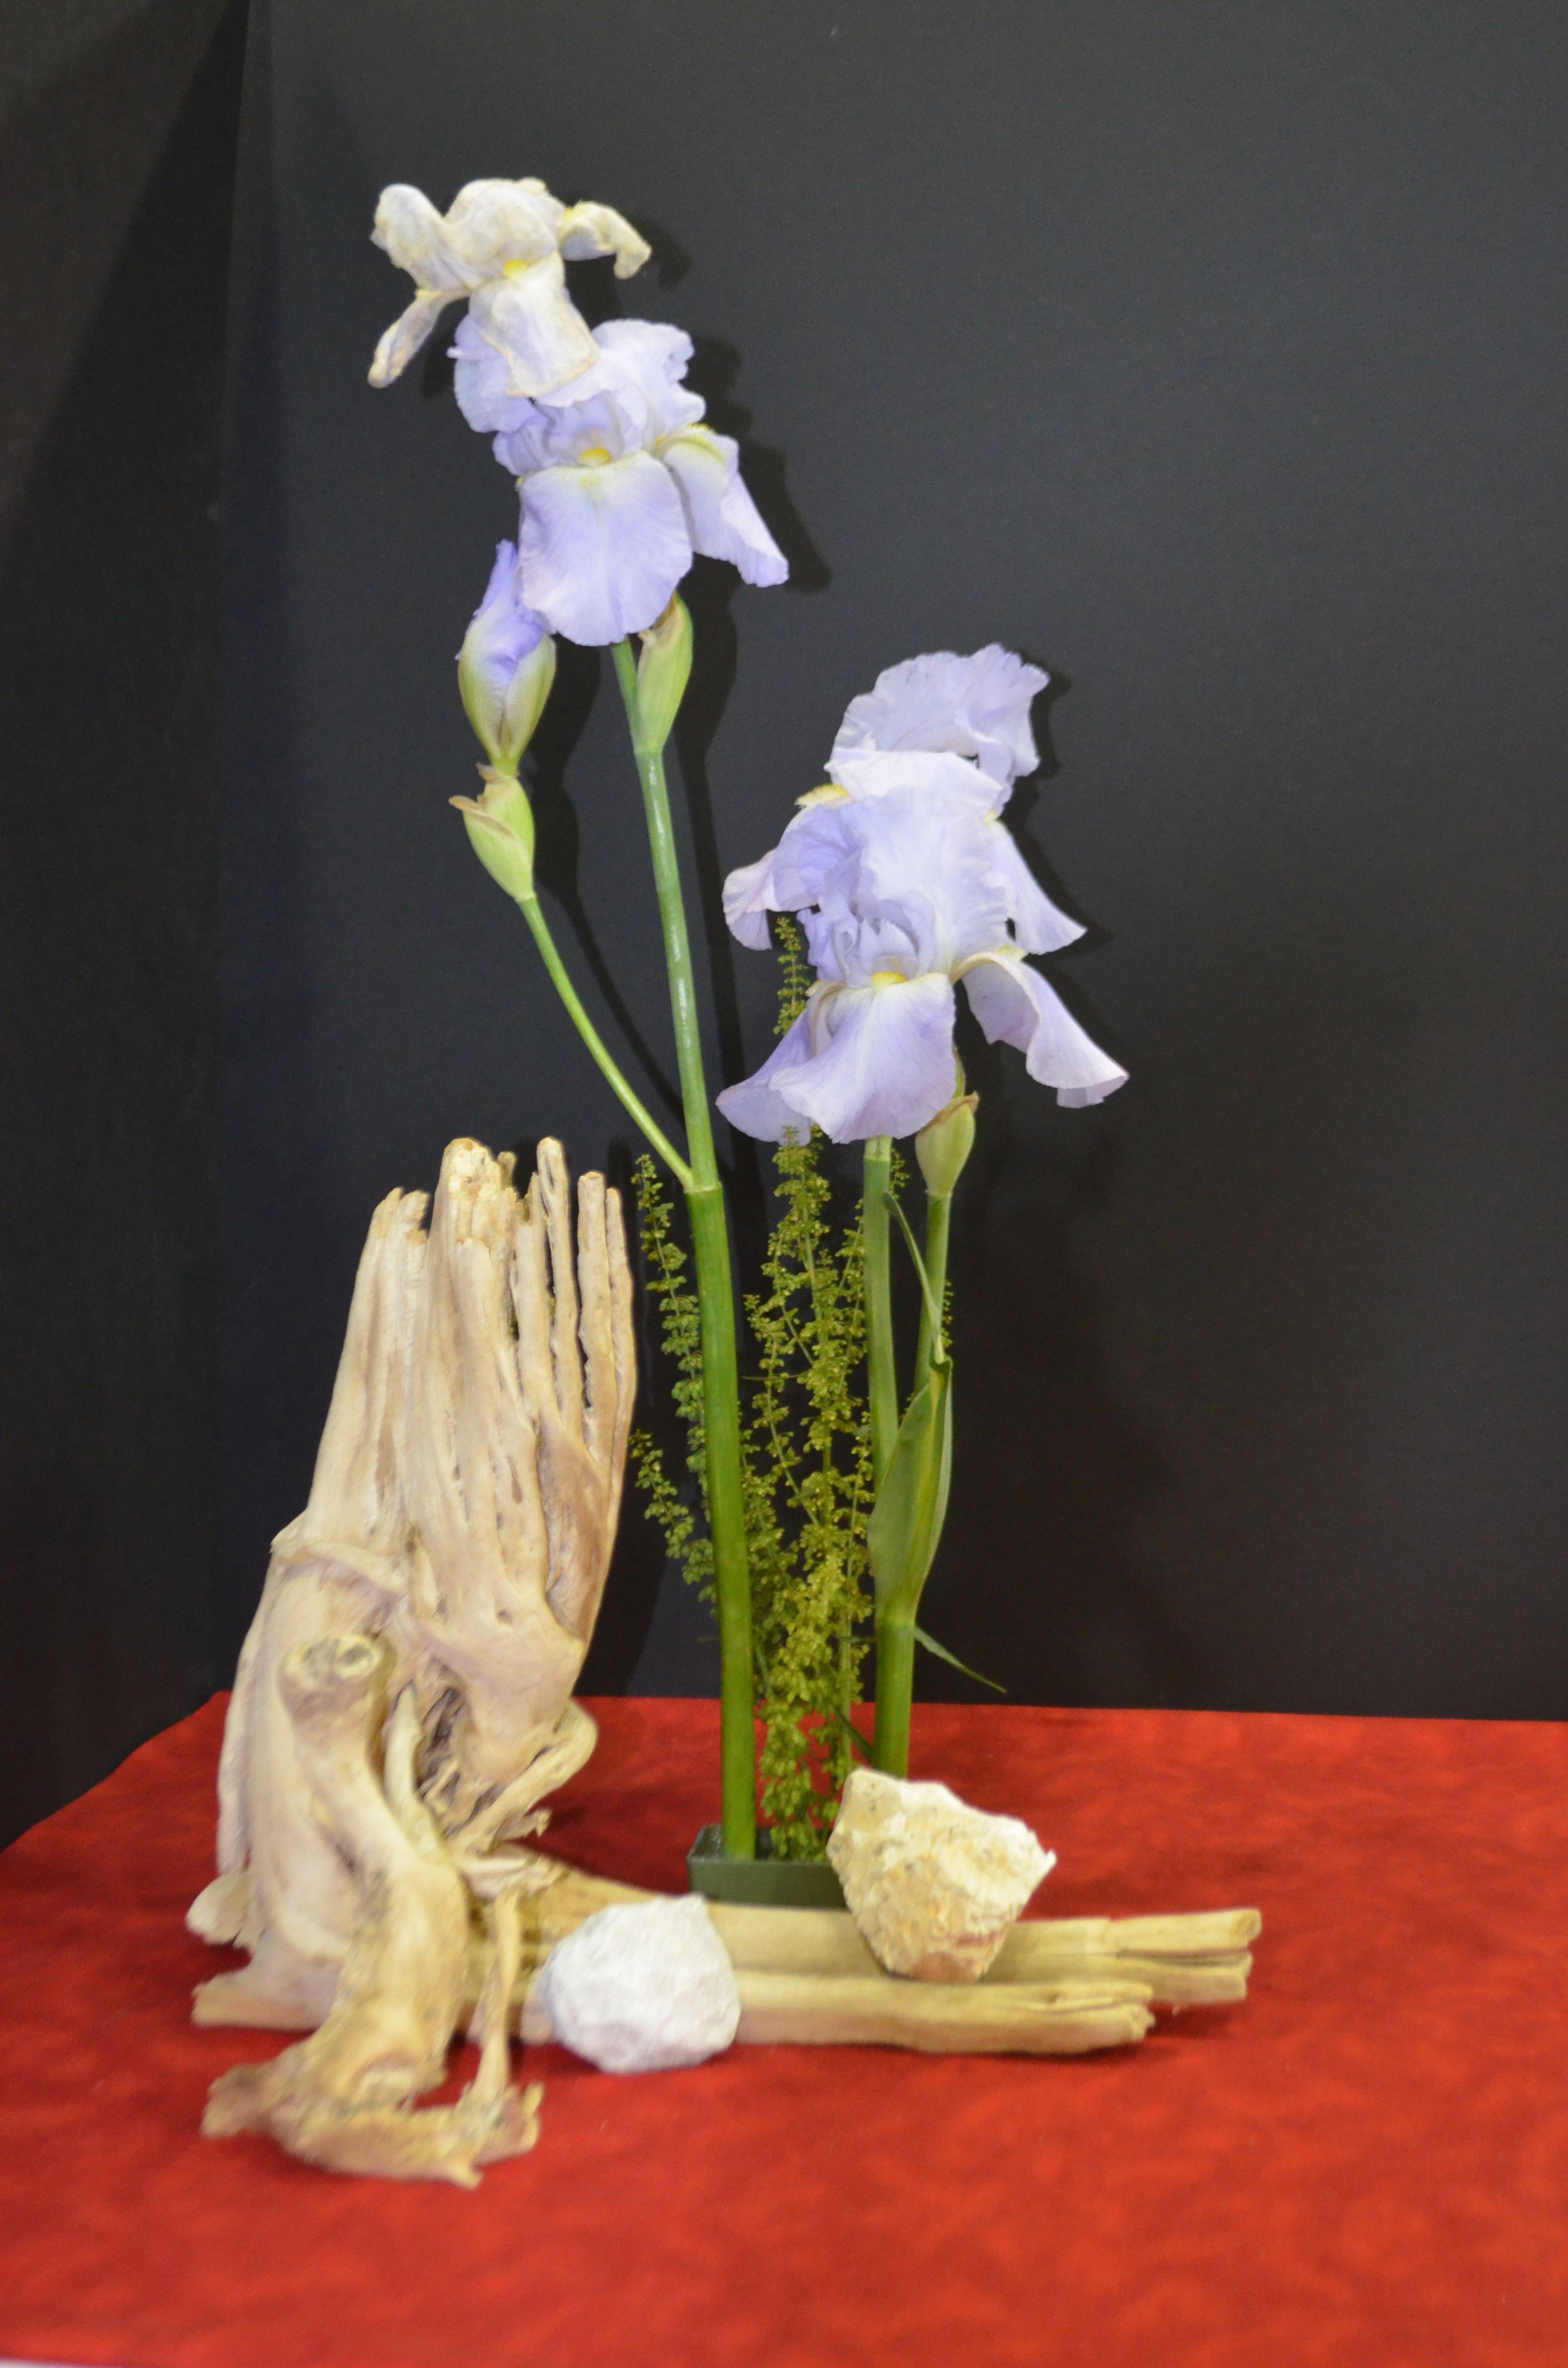 designer's choice exhibit. standard flower show. north end council